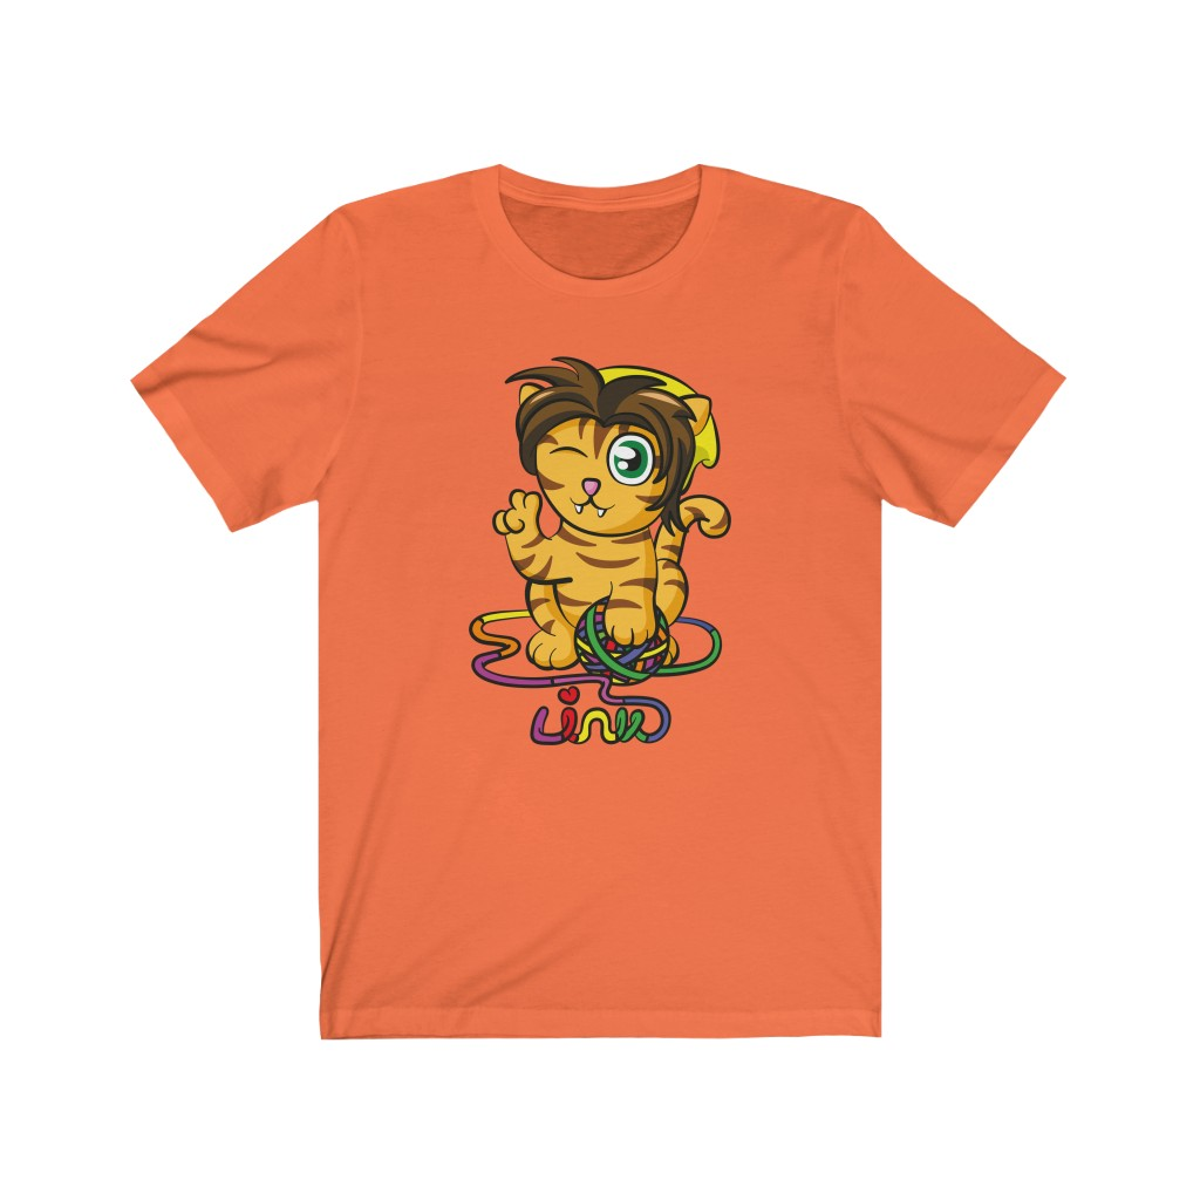 Pjoes T-shirt